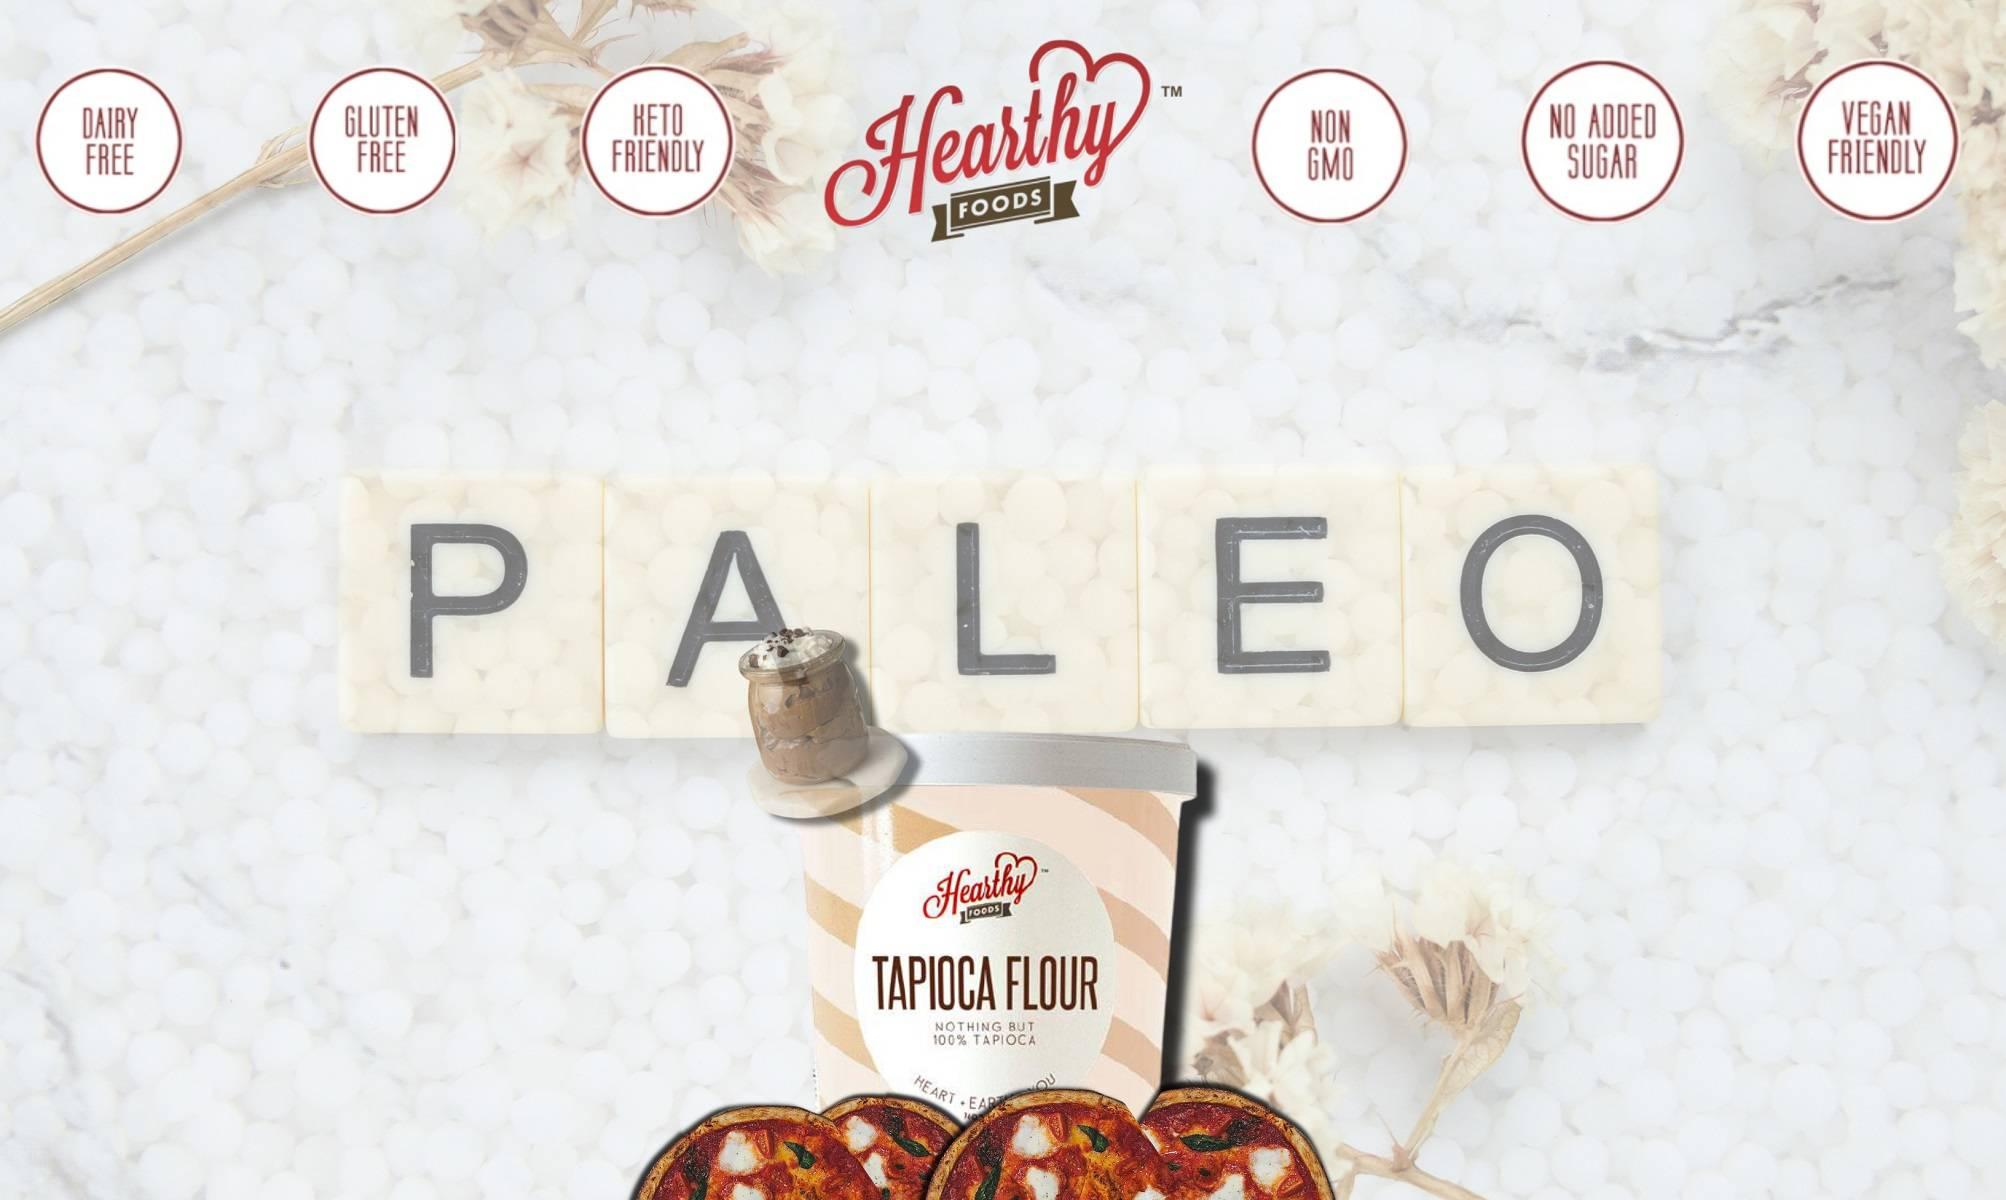 Hearthy Tapioca Flour